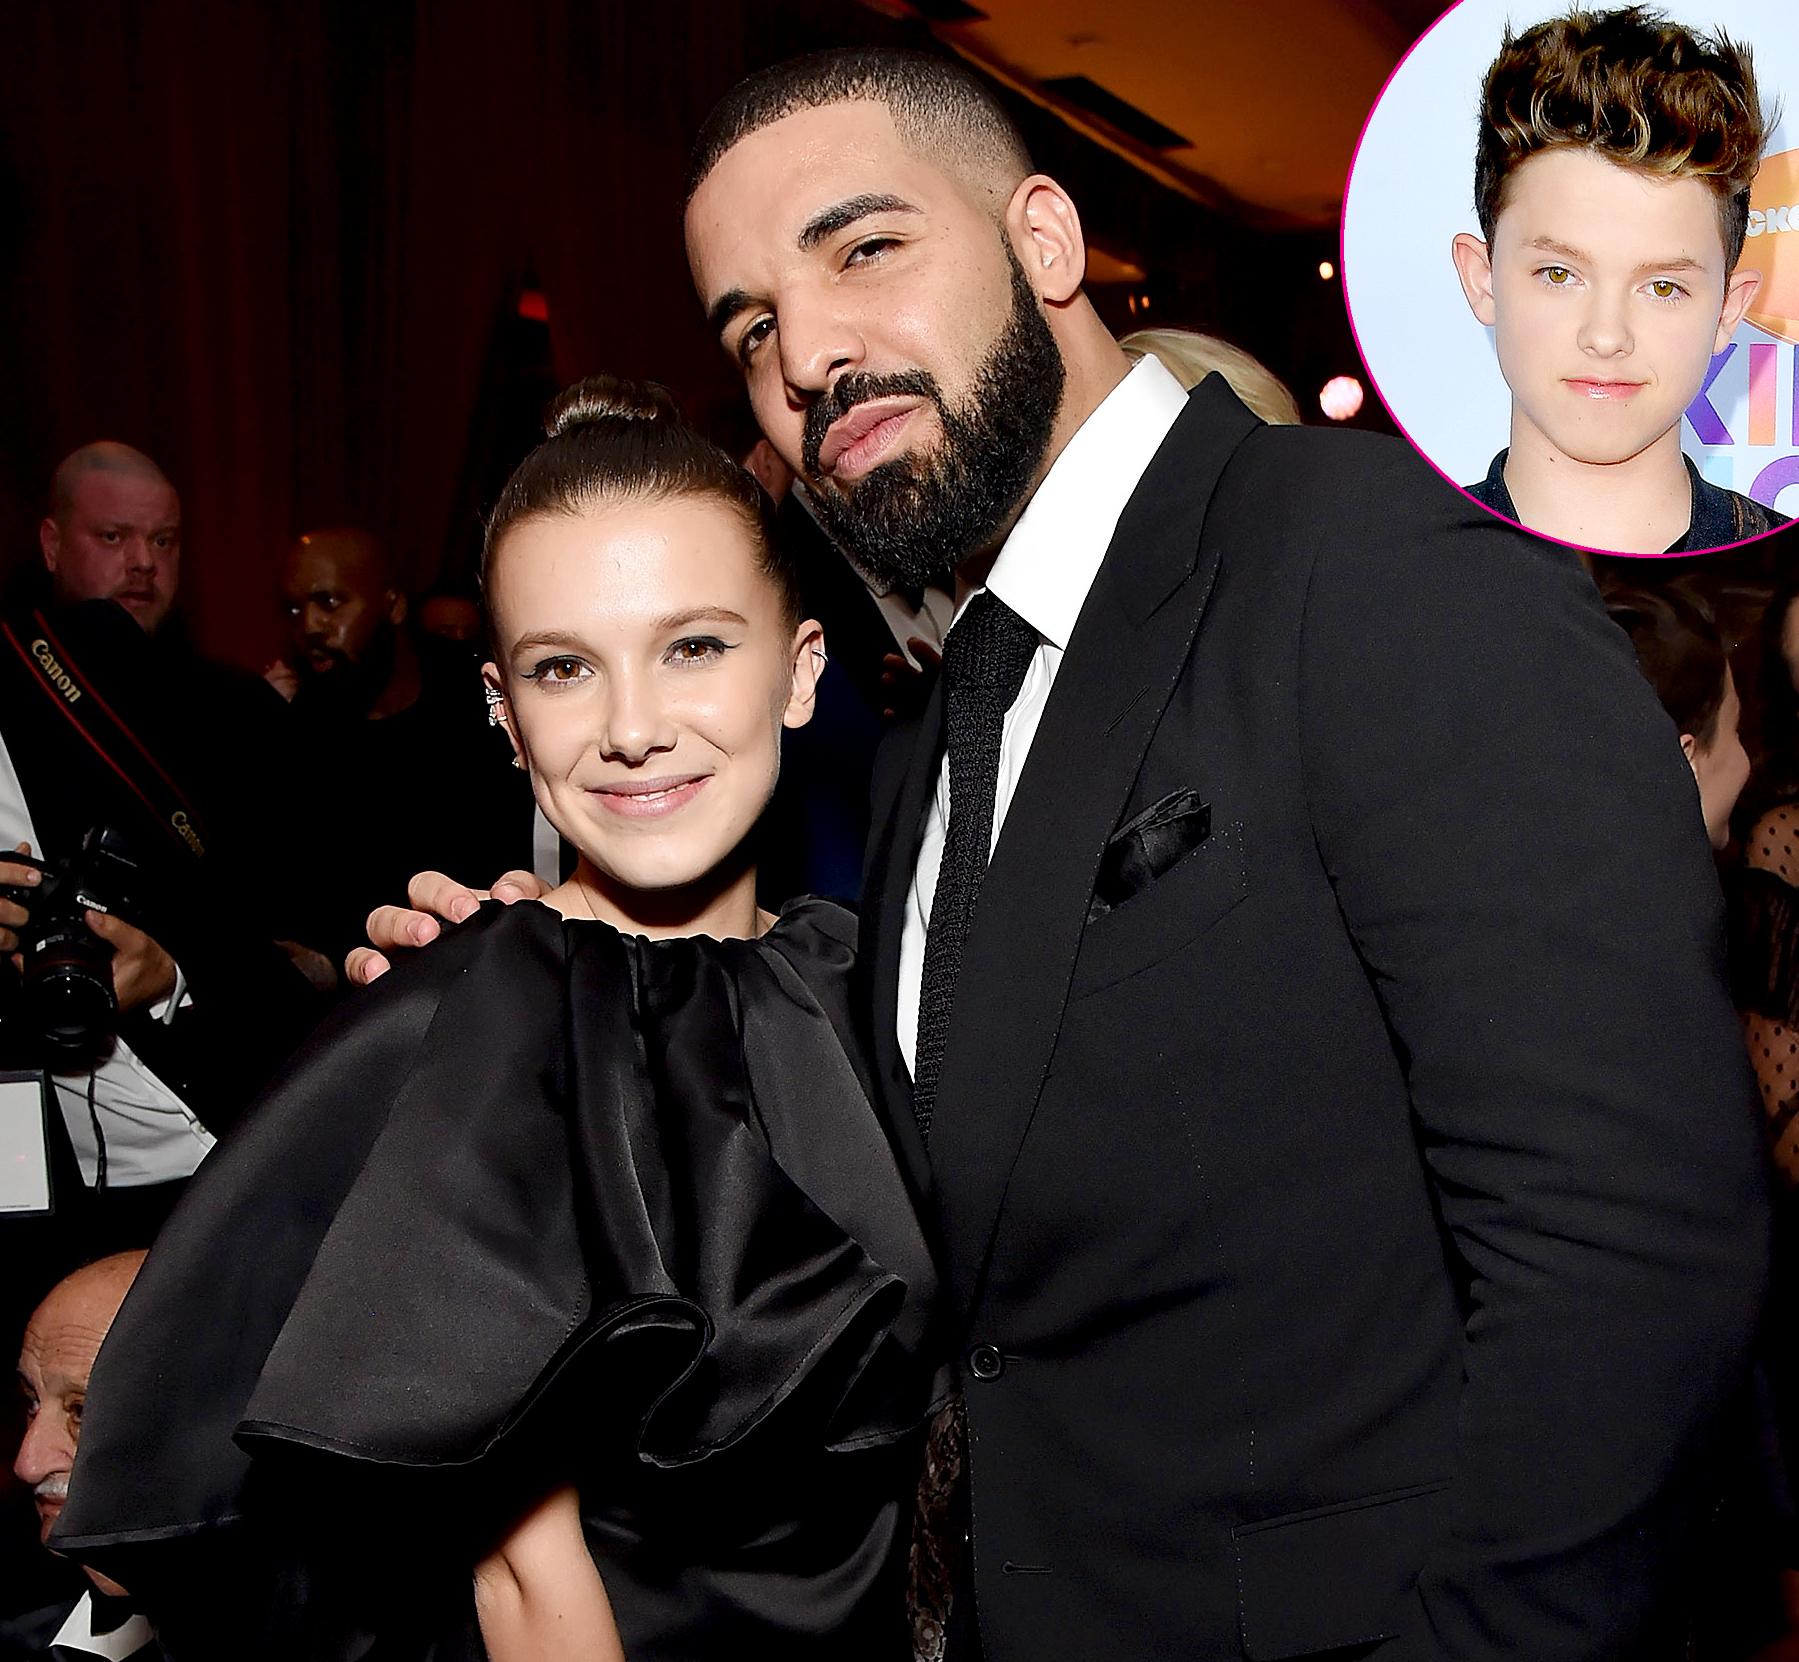 Jacob Sartorius Shades Millie Bobby Brown's Friendship With Drake